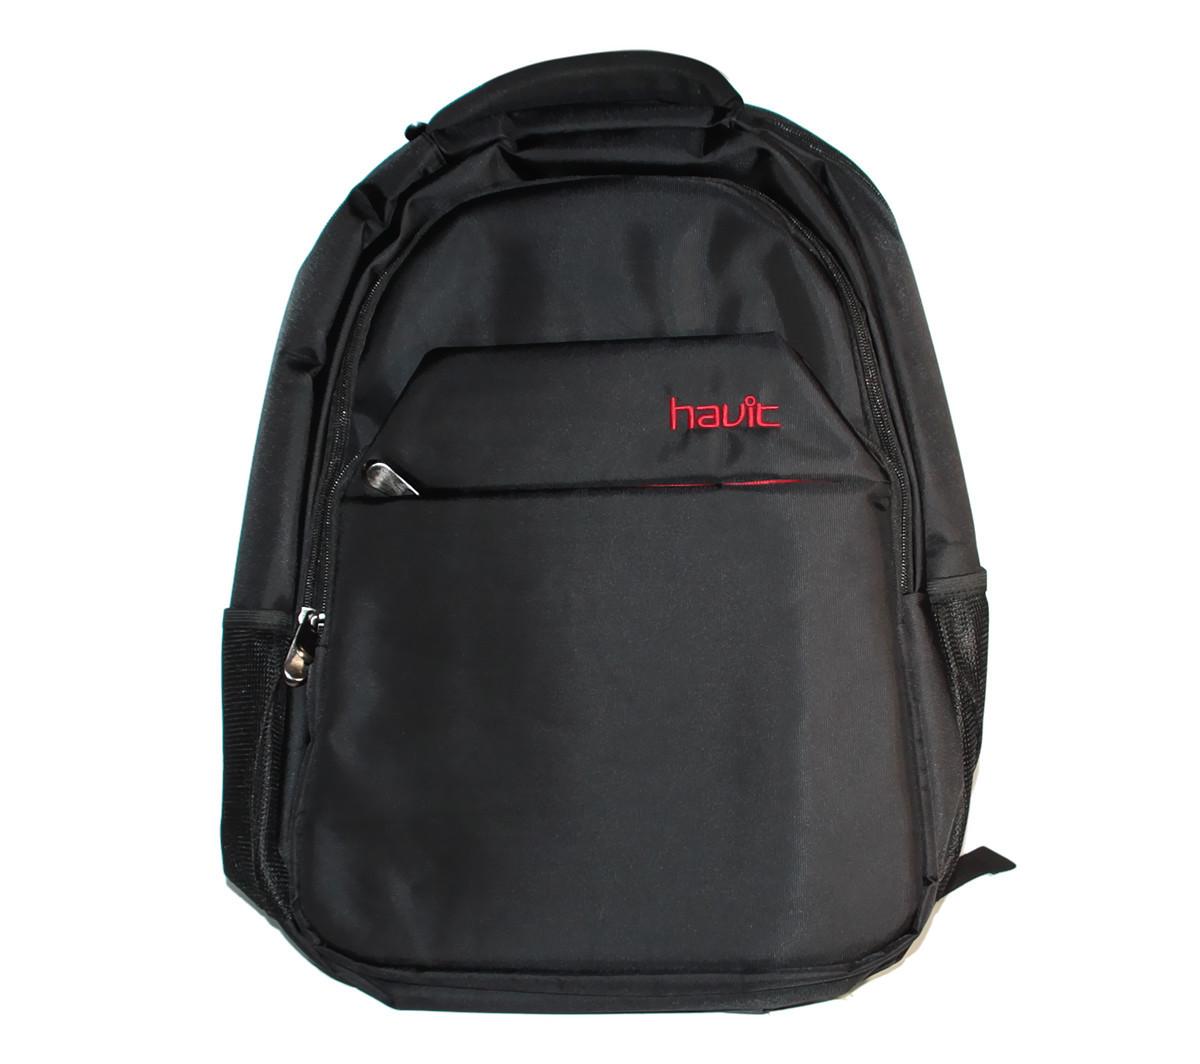 "Рюкзак Havit HV-B915 Black / под ноутбук 18.5"" /"